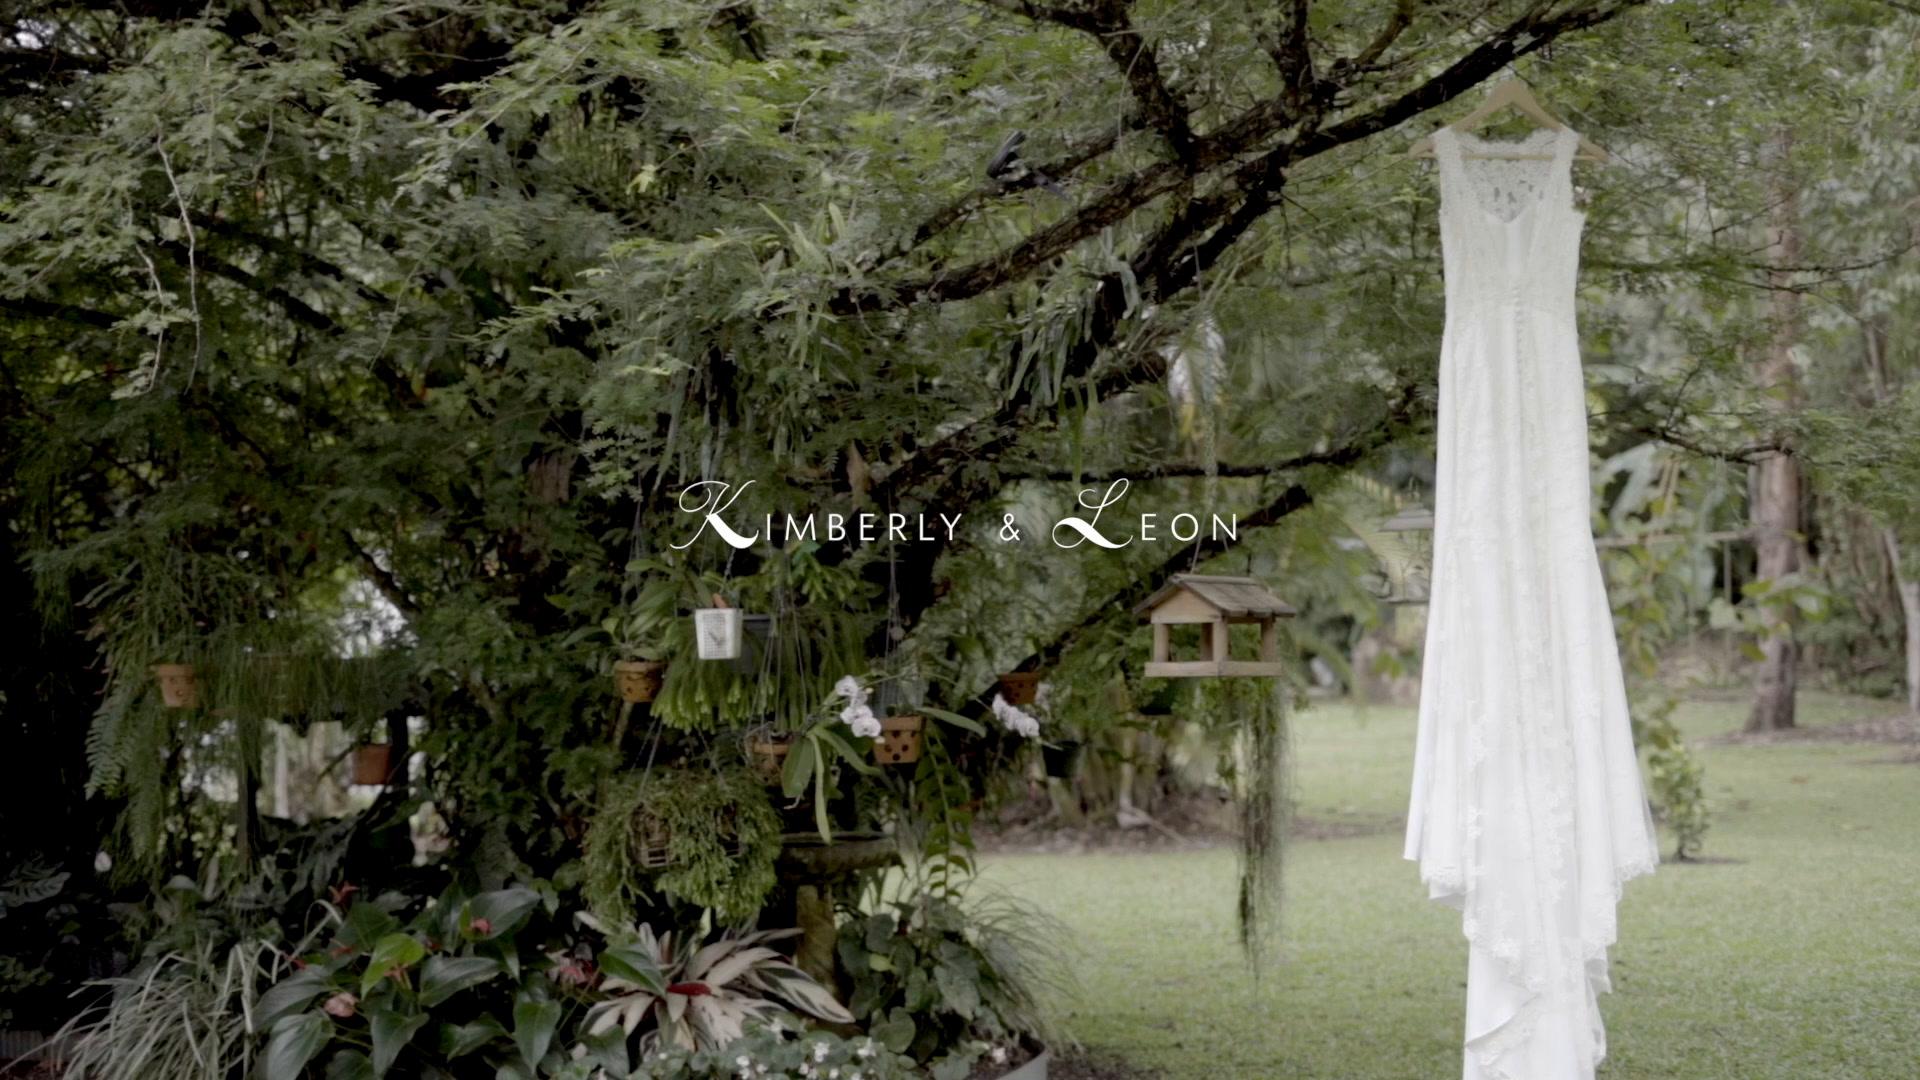 Kimberly  + Leon | Mission Beach, Australia | Castaways resort and spa Mission Beach